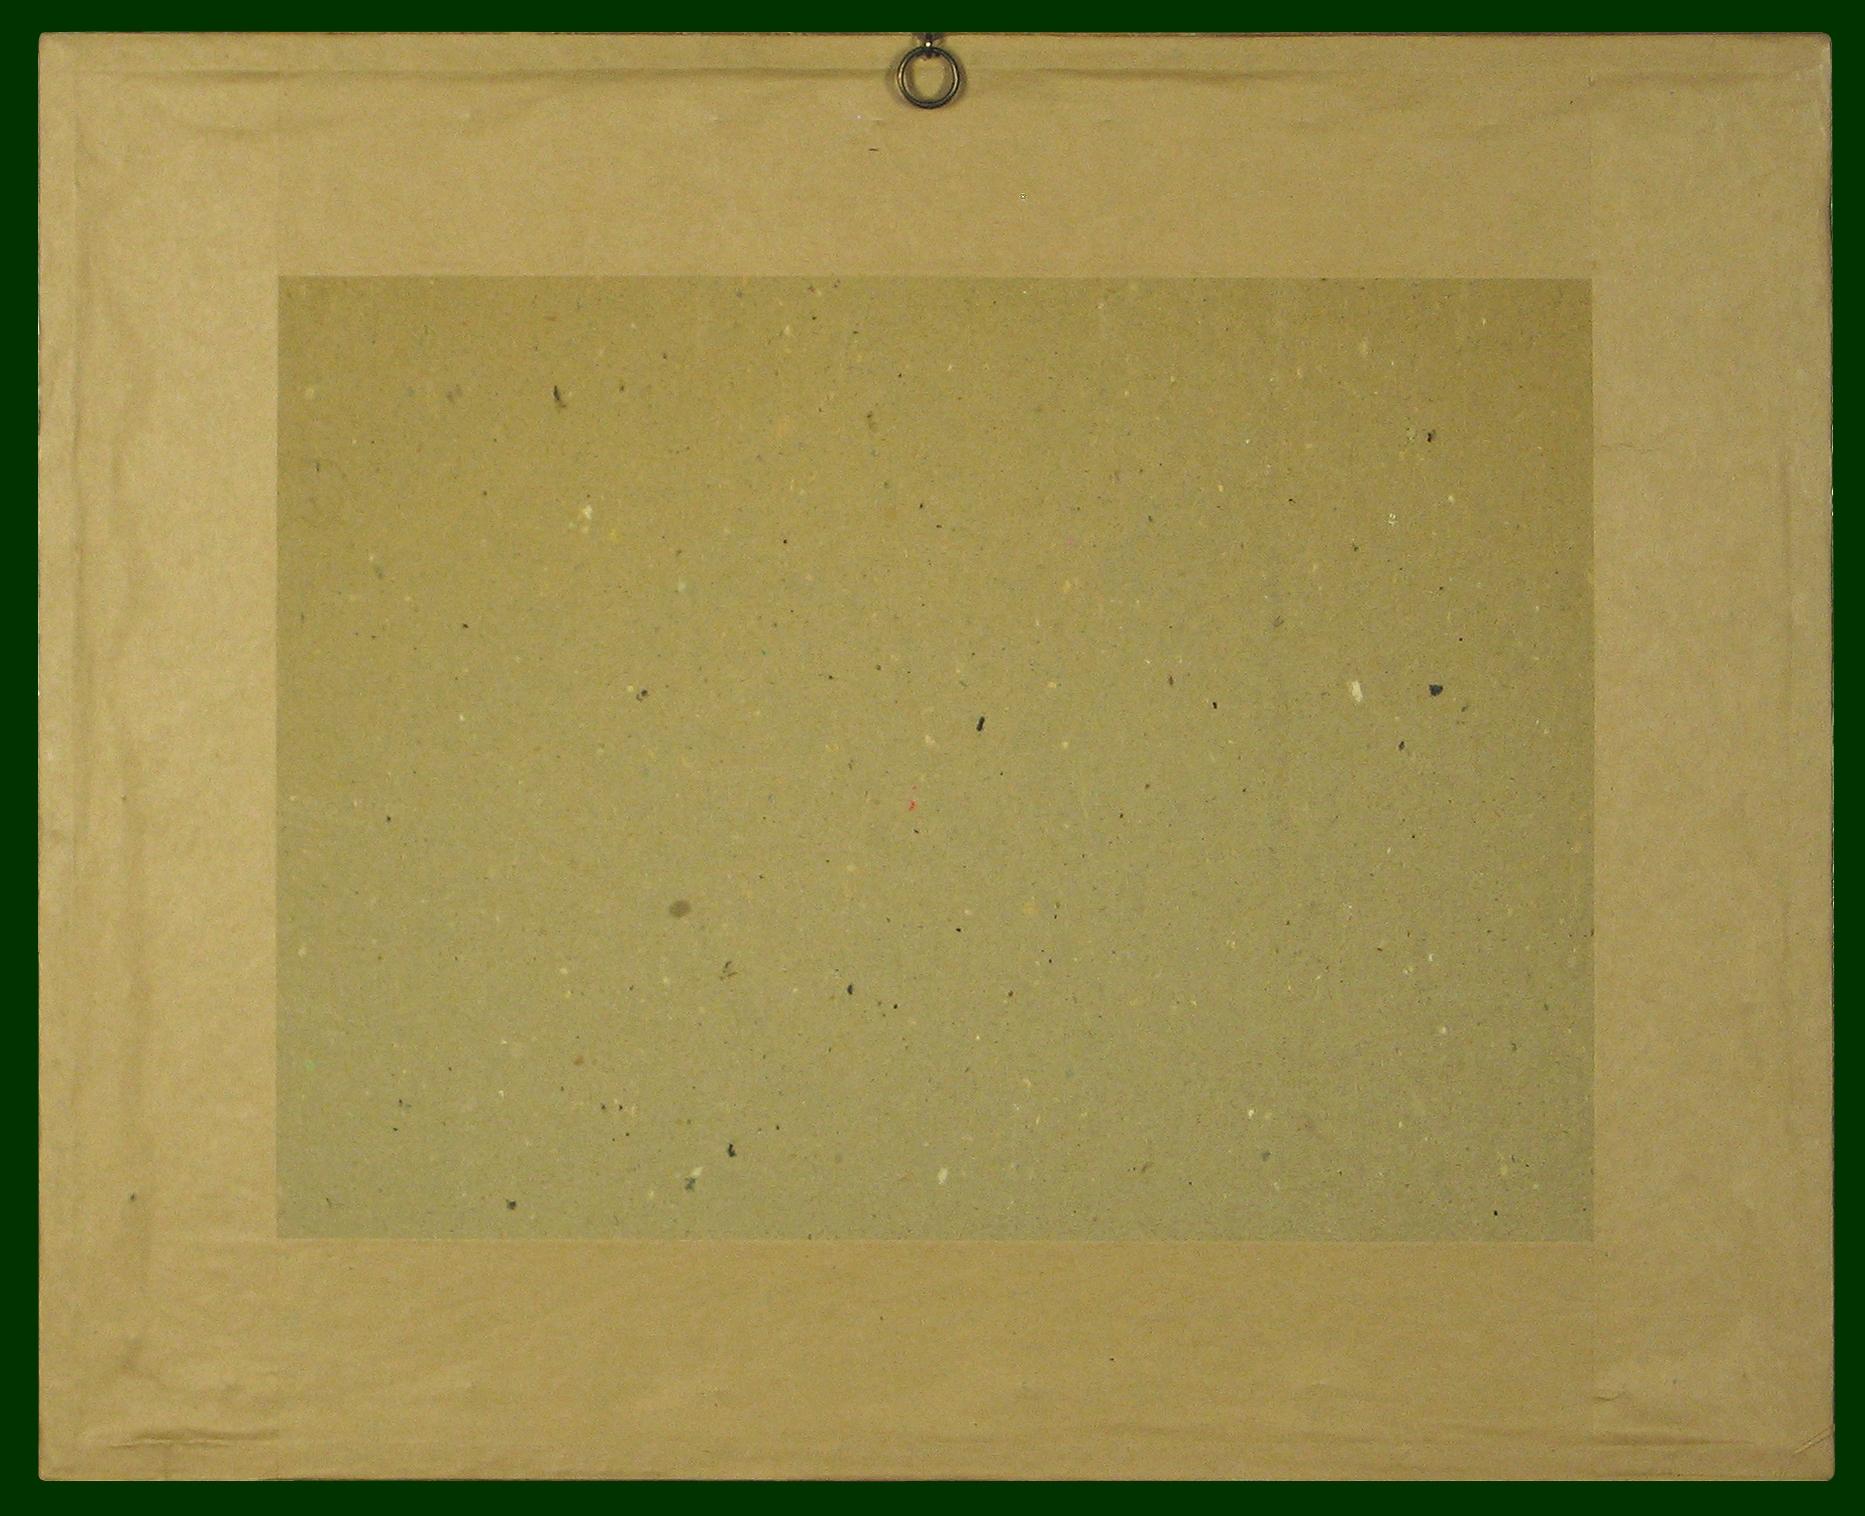 51-9h_t.jpg (1865�1516)